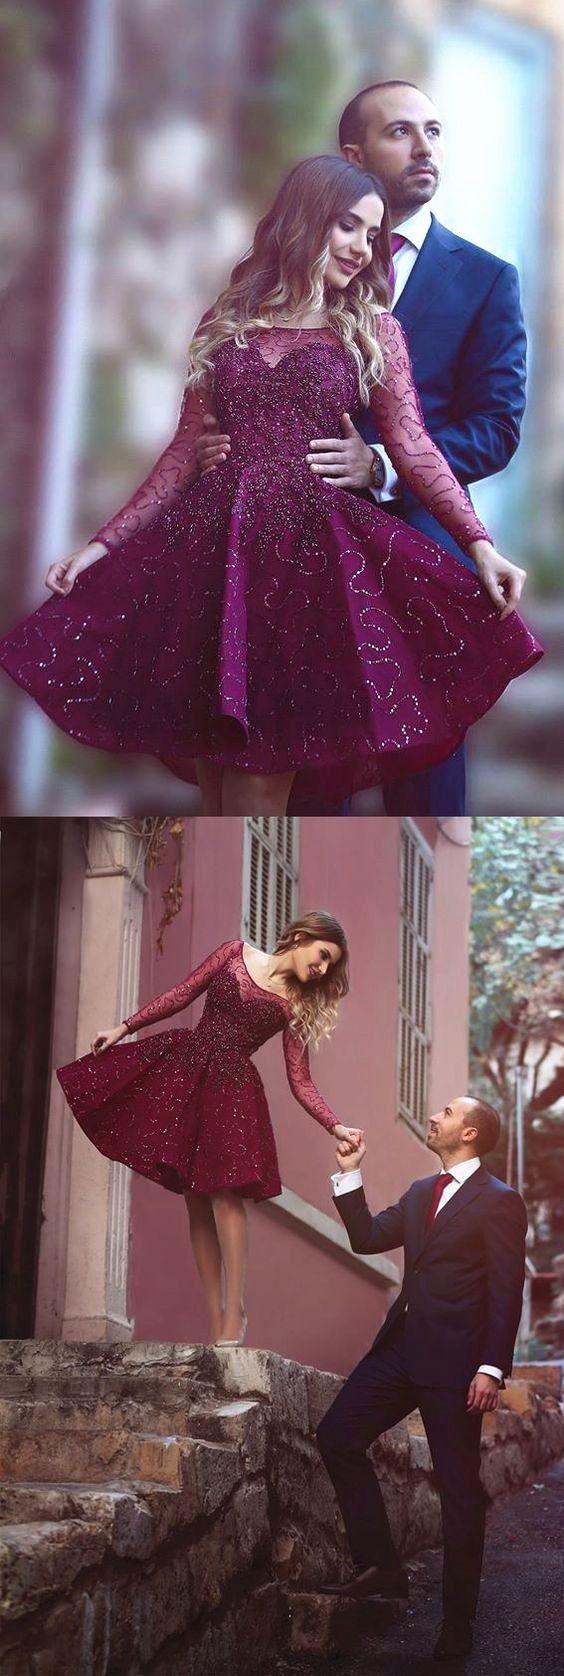 long sleeves prom dresses, short prom dresses, lace prom dresses, spring dresses, beaded prom dresses, fuchsia prom dresses, bateau prom dresses, aline prom dresses